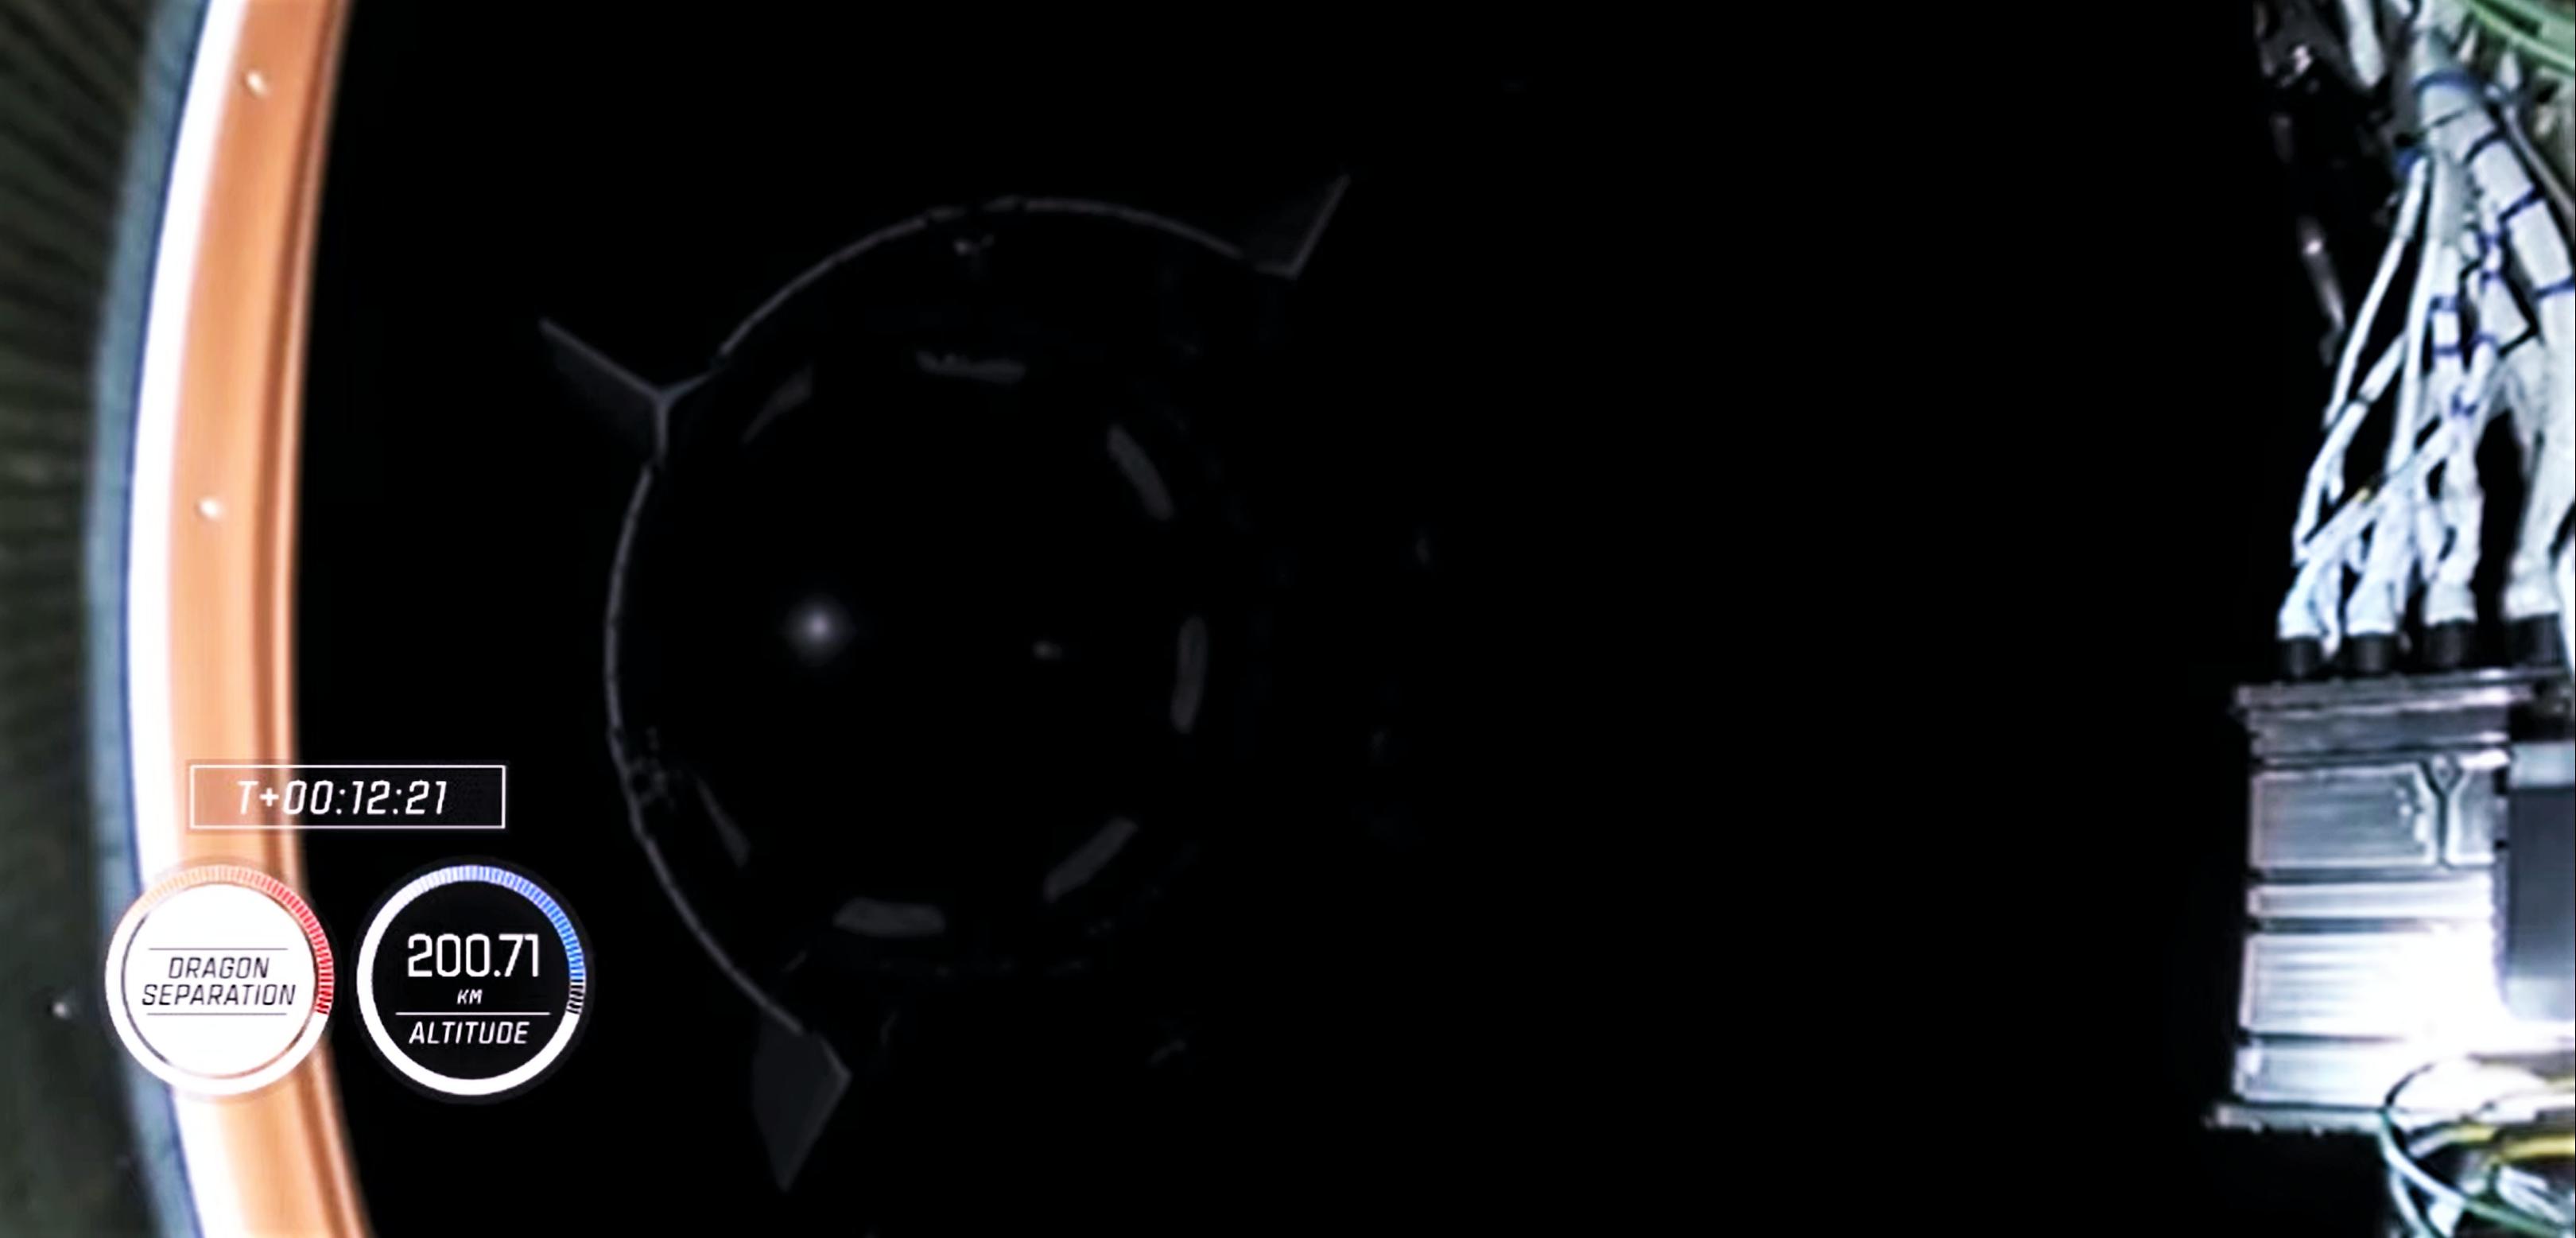 Crew-1 Crew Dragon C207 Falcon 9 B1061 webcast 111520 (NASA) deploy 1